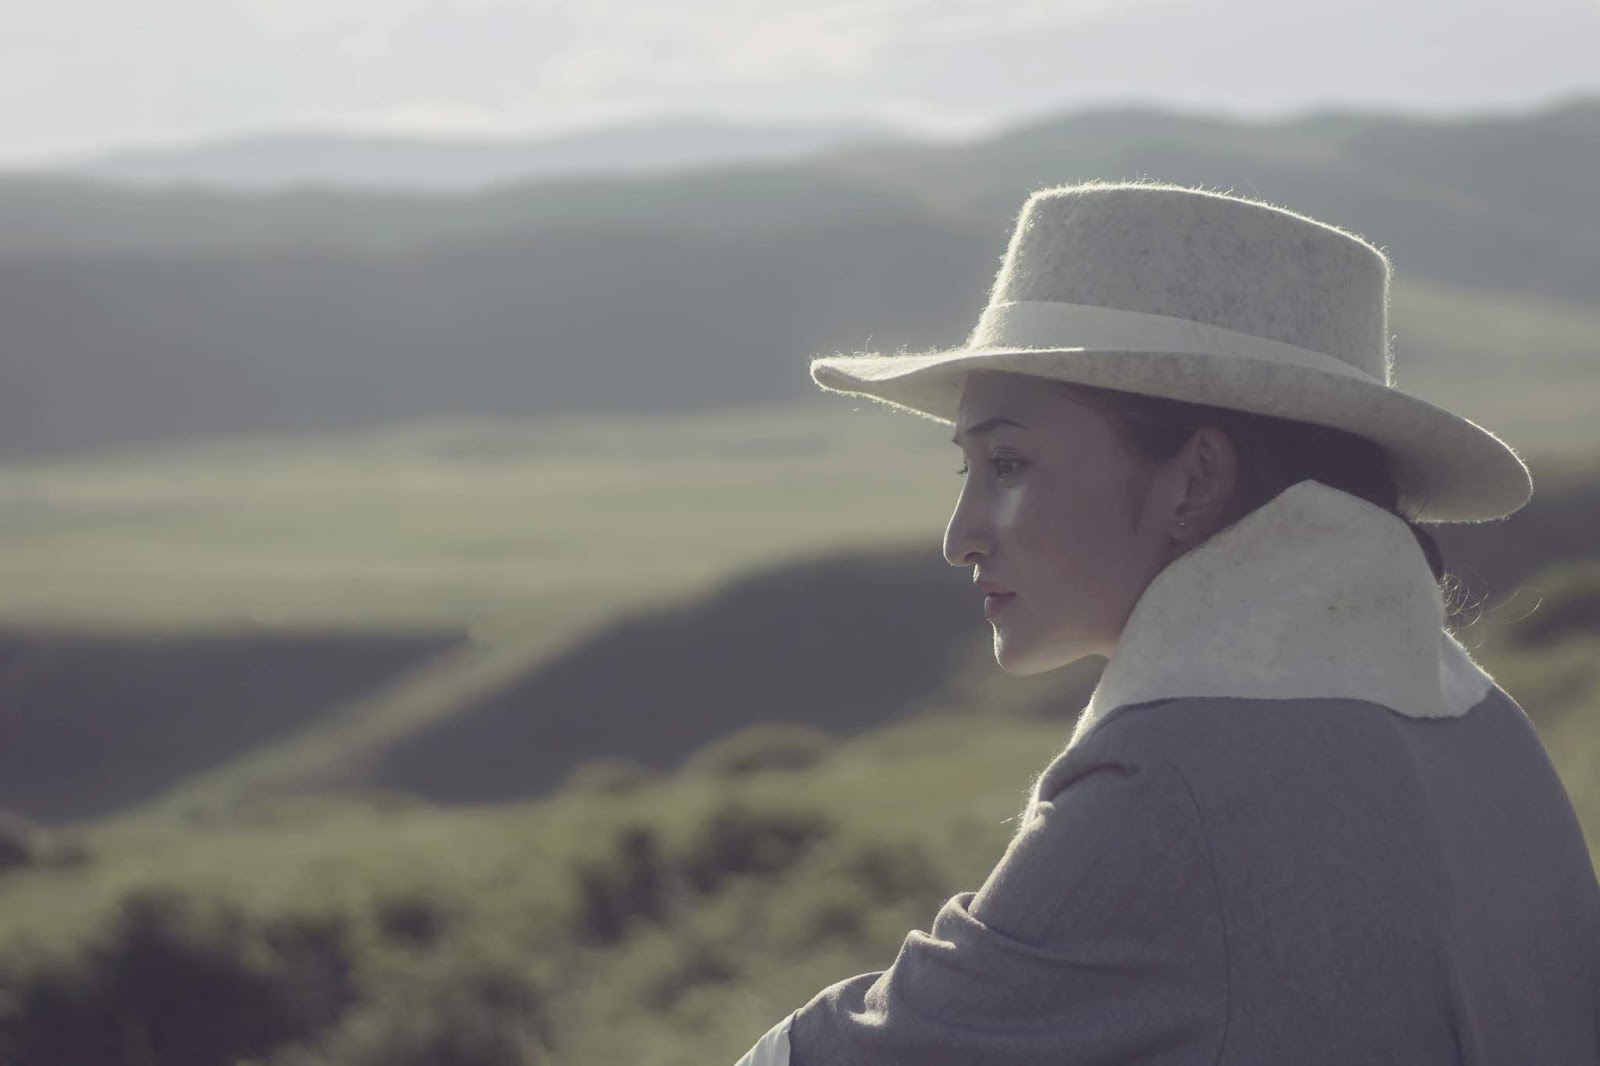 White Cowboy Felt Hat | SHANGDROK